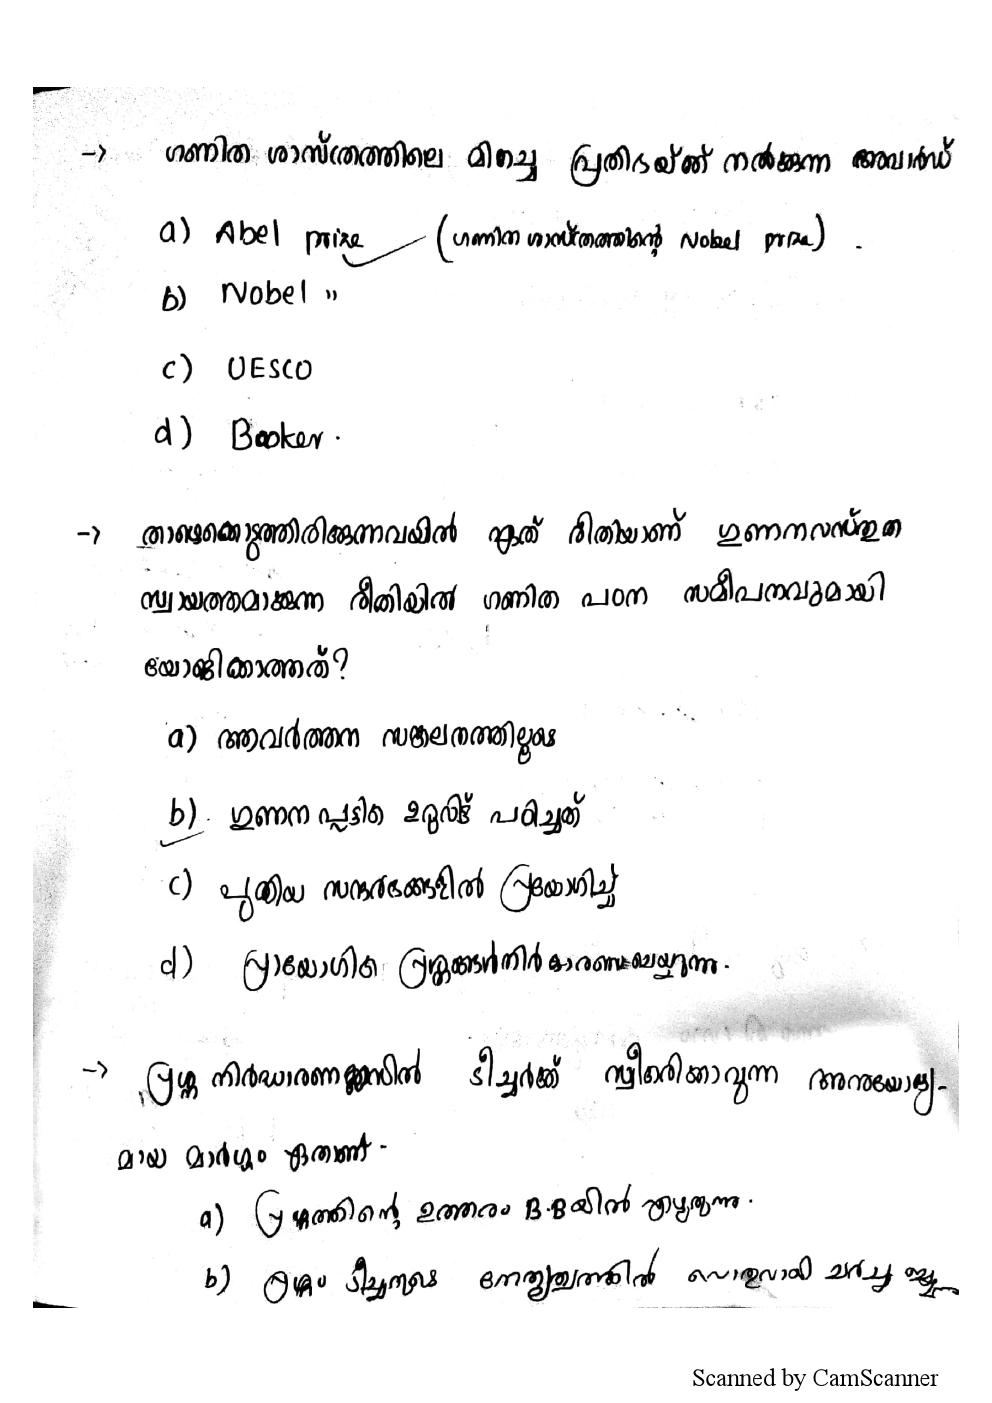 http://masterstudy.net/pdf/ktet_notes0028.png